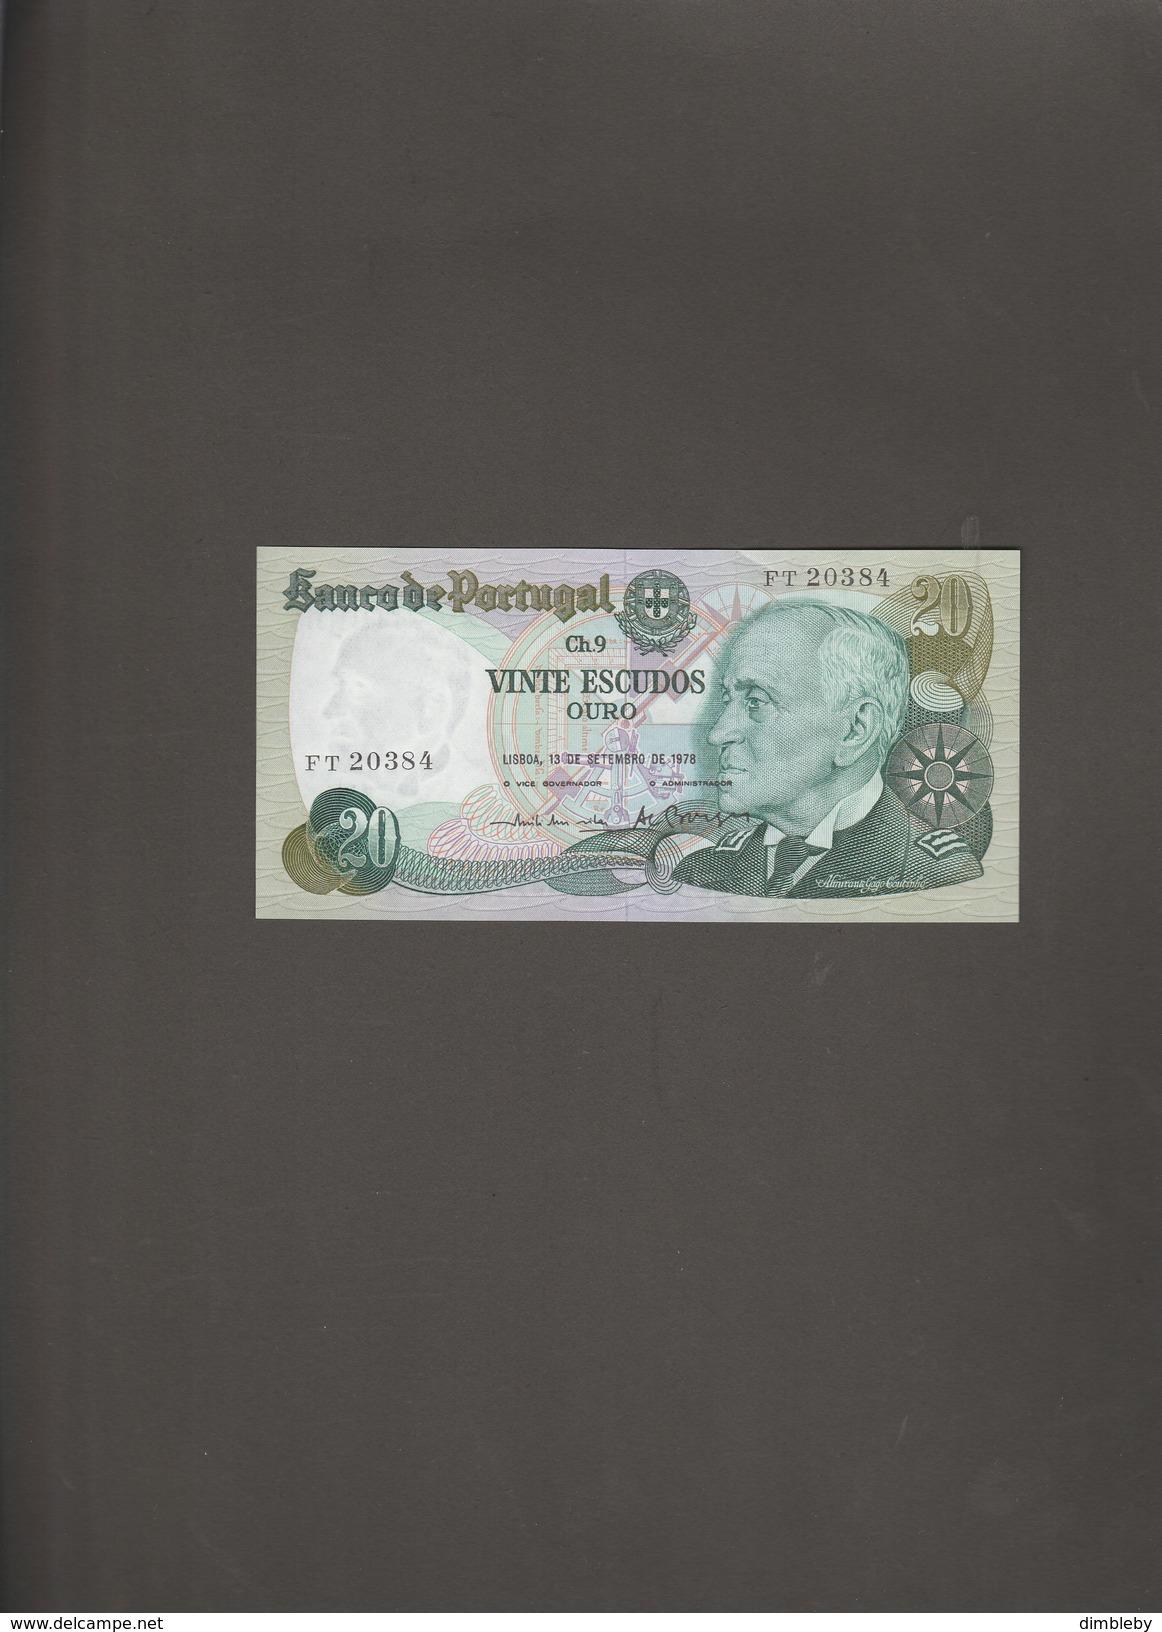 20 Escudos 1978 - Portugal